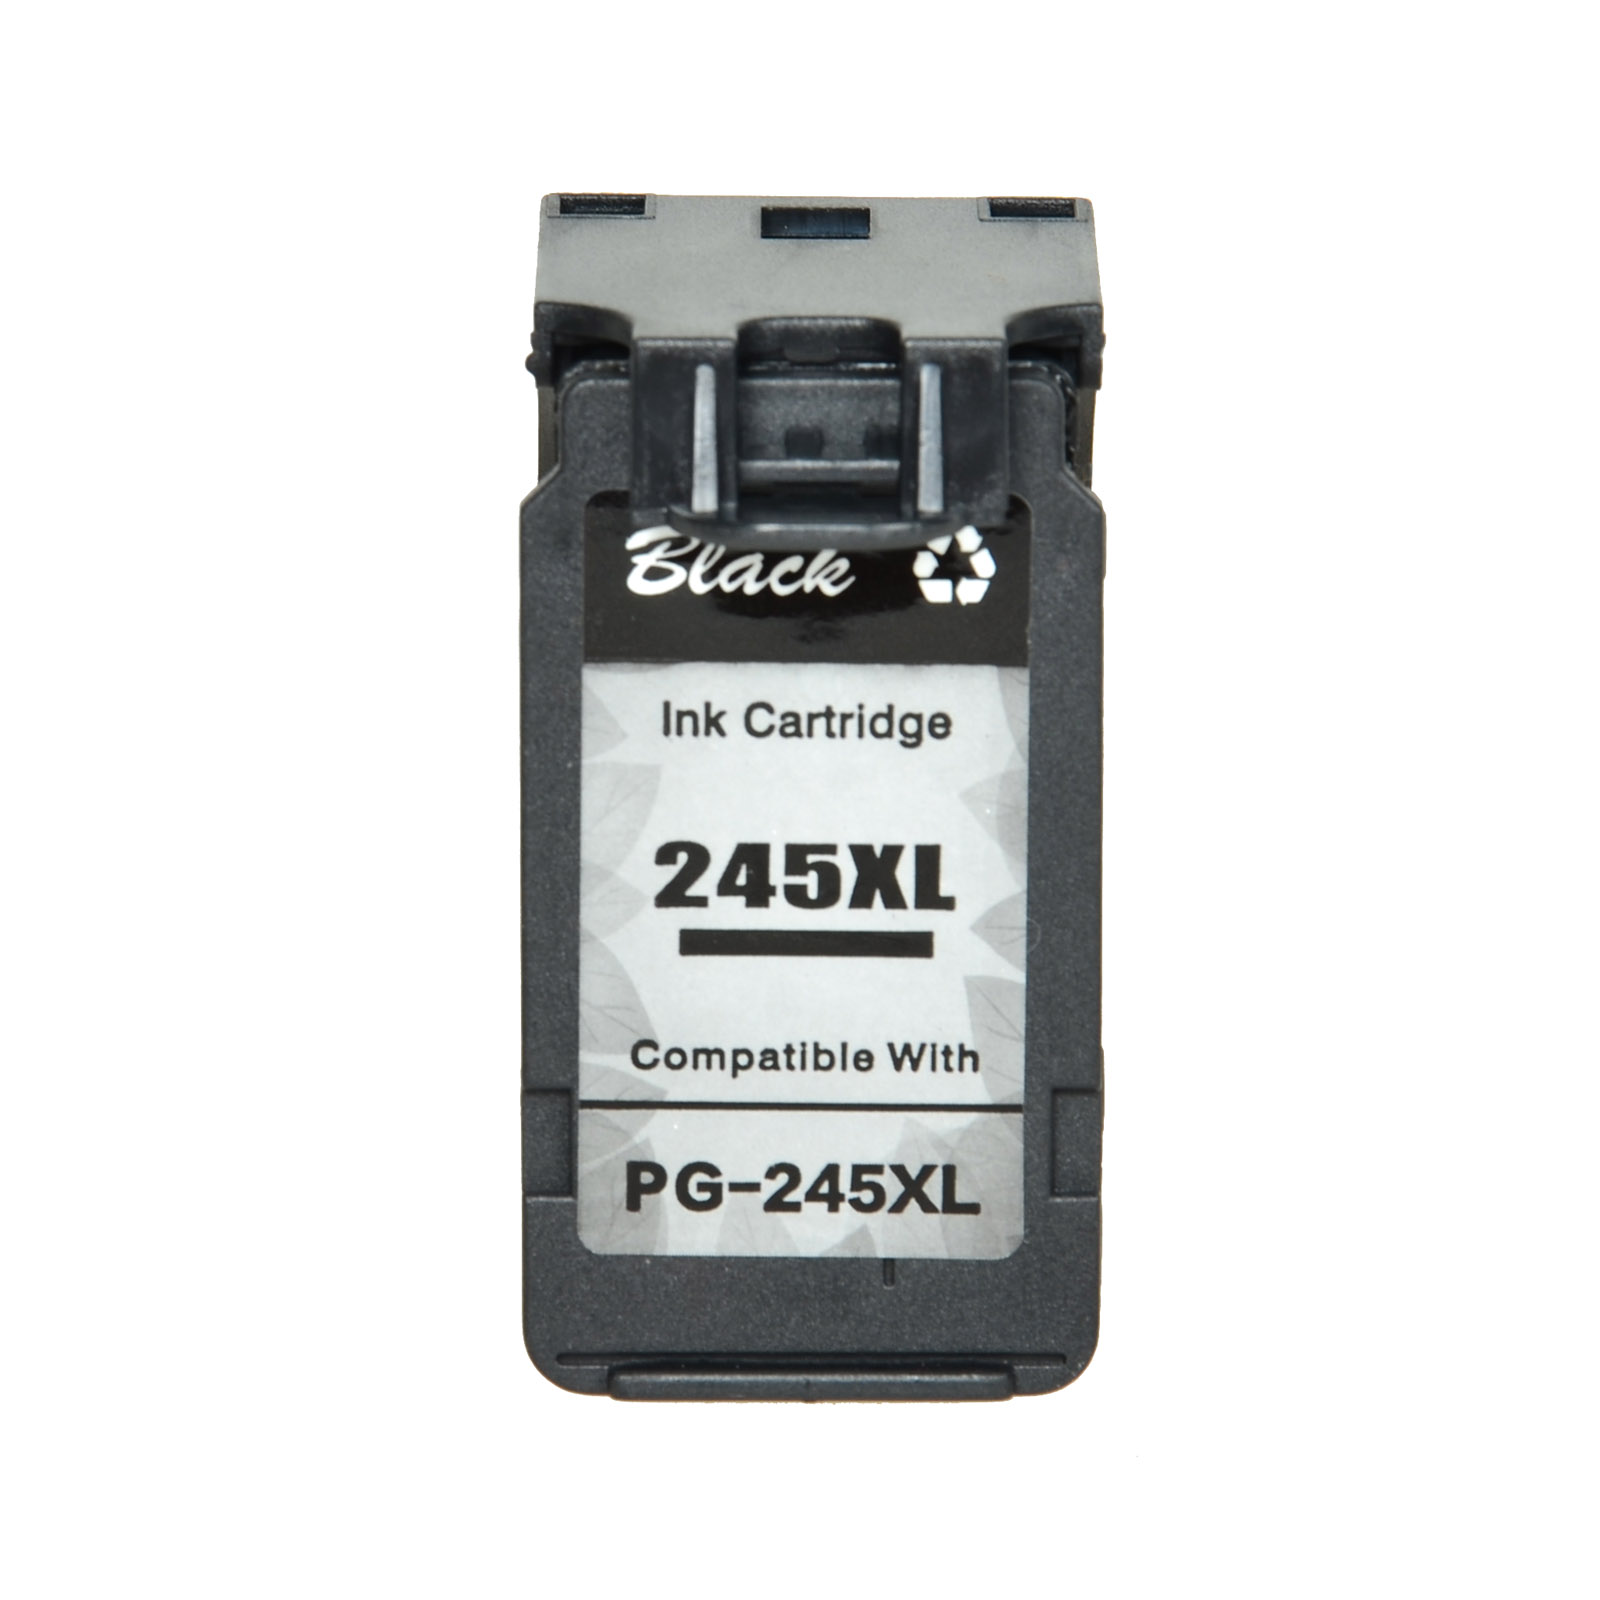 6PK PG245XL Black Ink Cartridge For Canon PIXMA iP2850 MG2450 MX490 MG2420 MX492